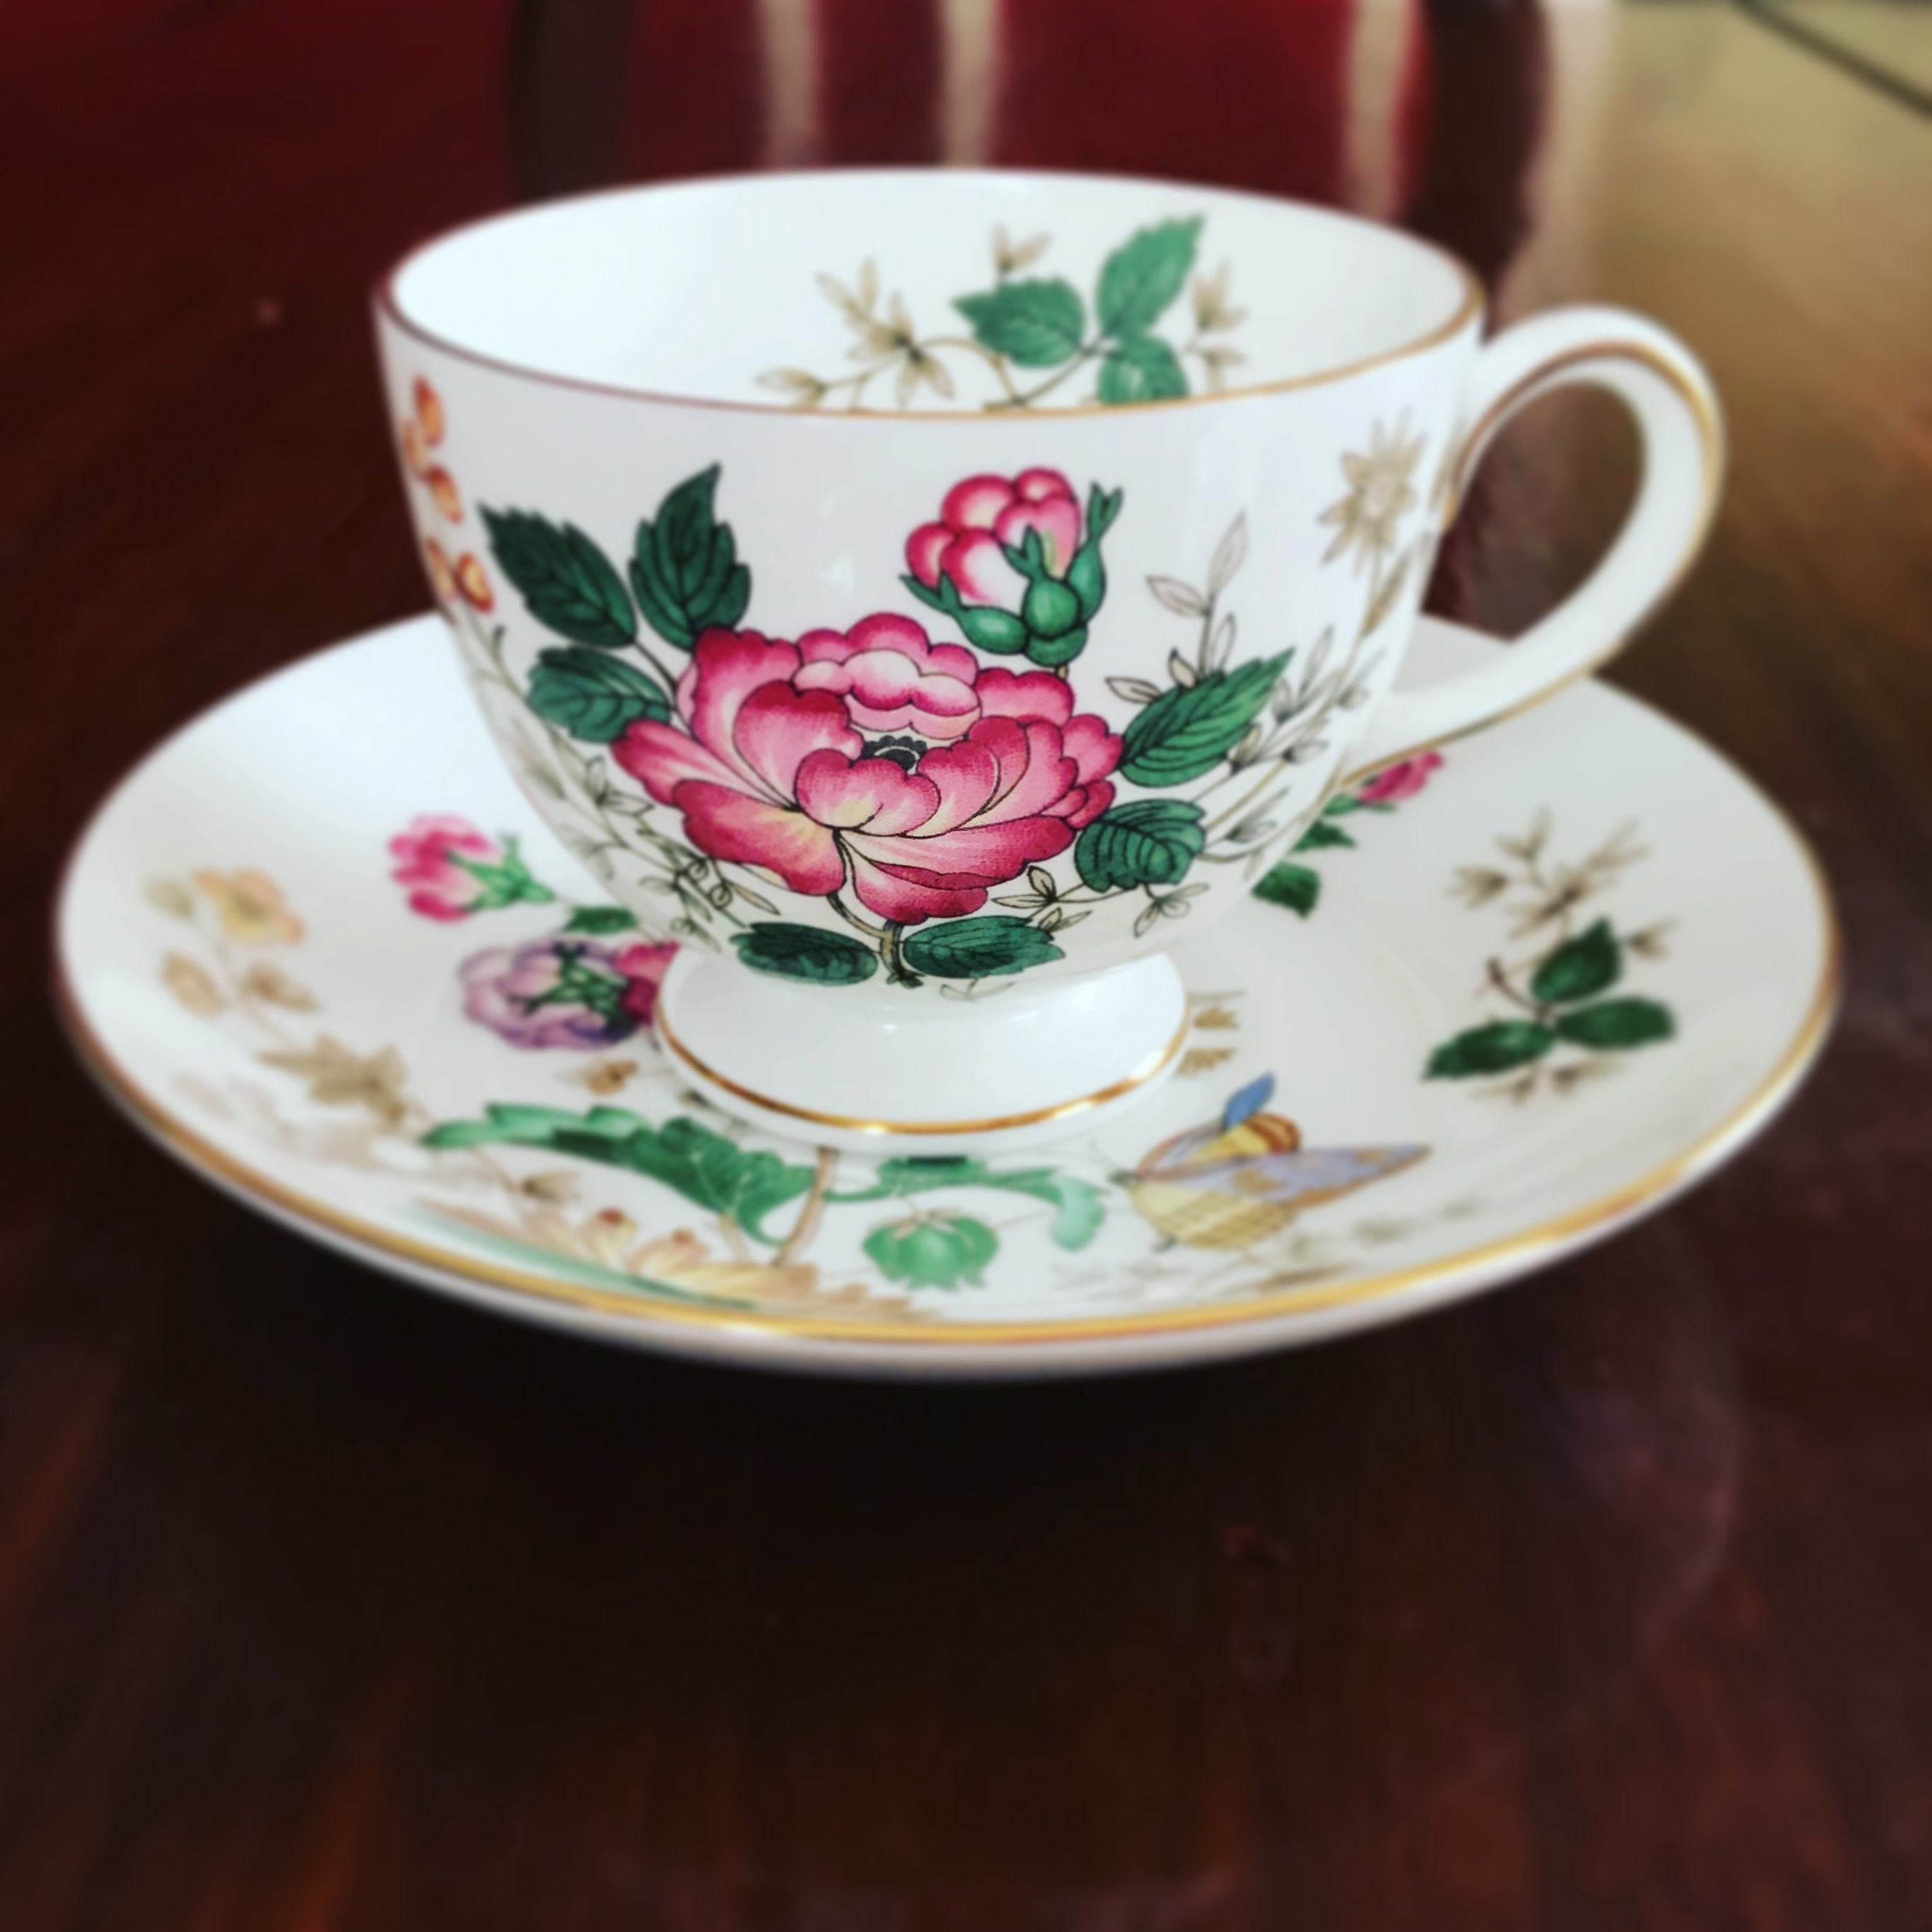 Wedgwood teacup and saucer